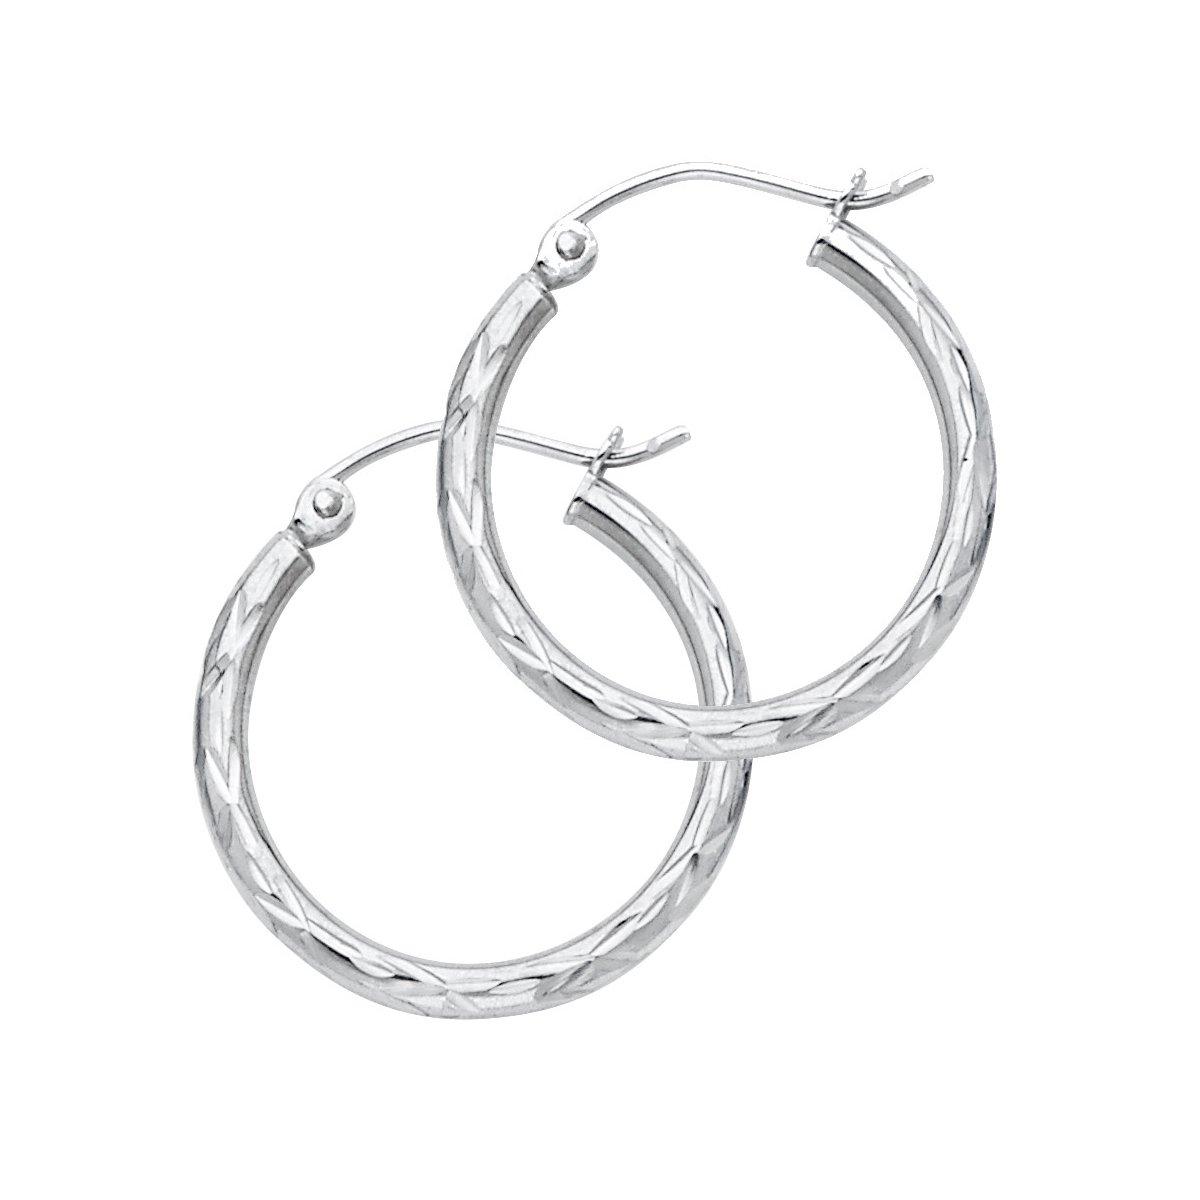 Diameter - 20 MM 14K White Gold 2mm Diamond Cut Hoop Earrings